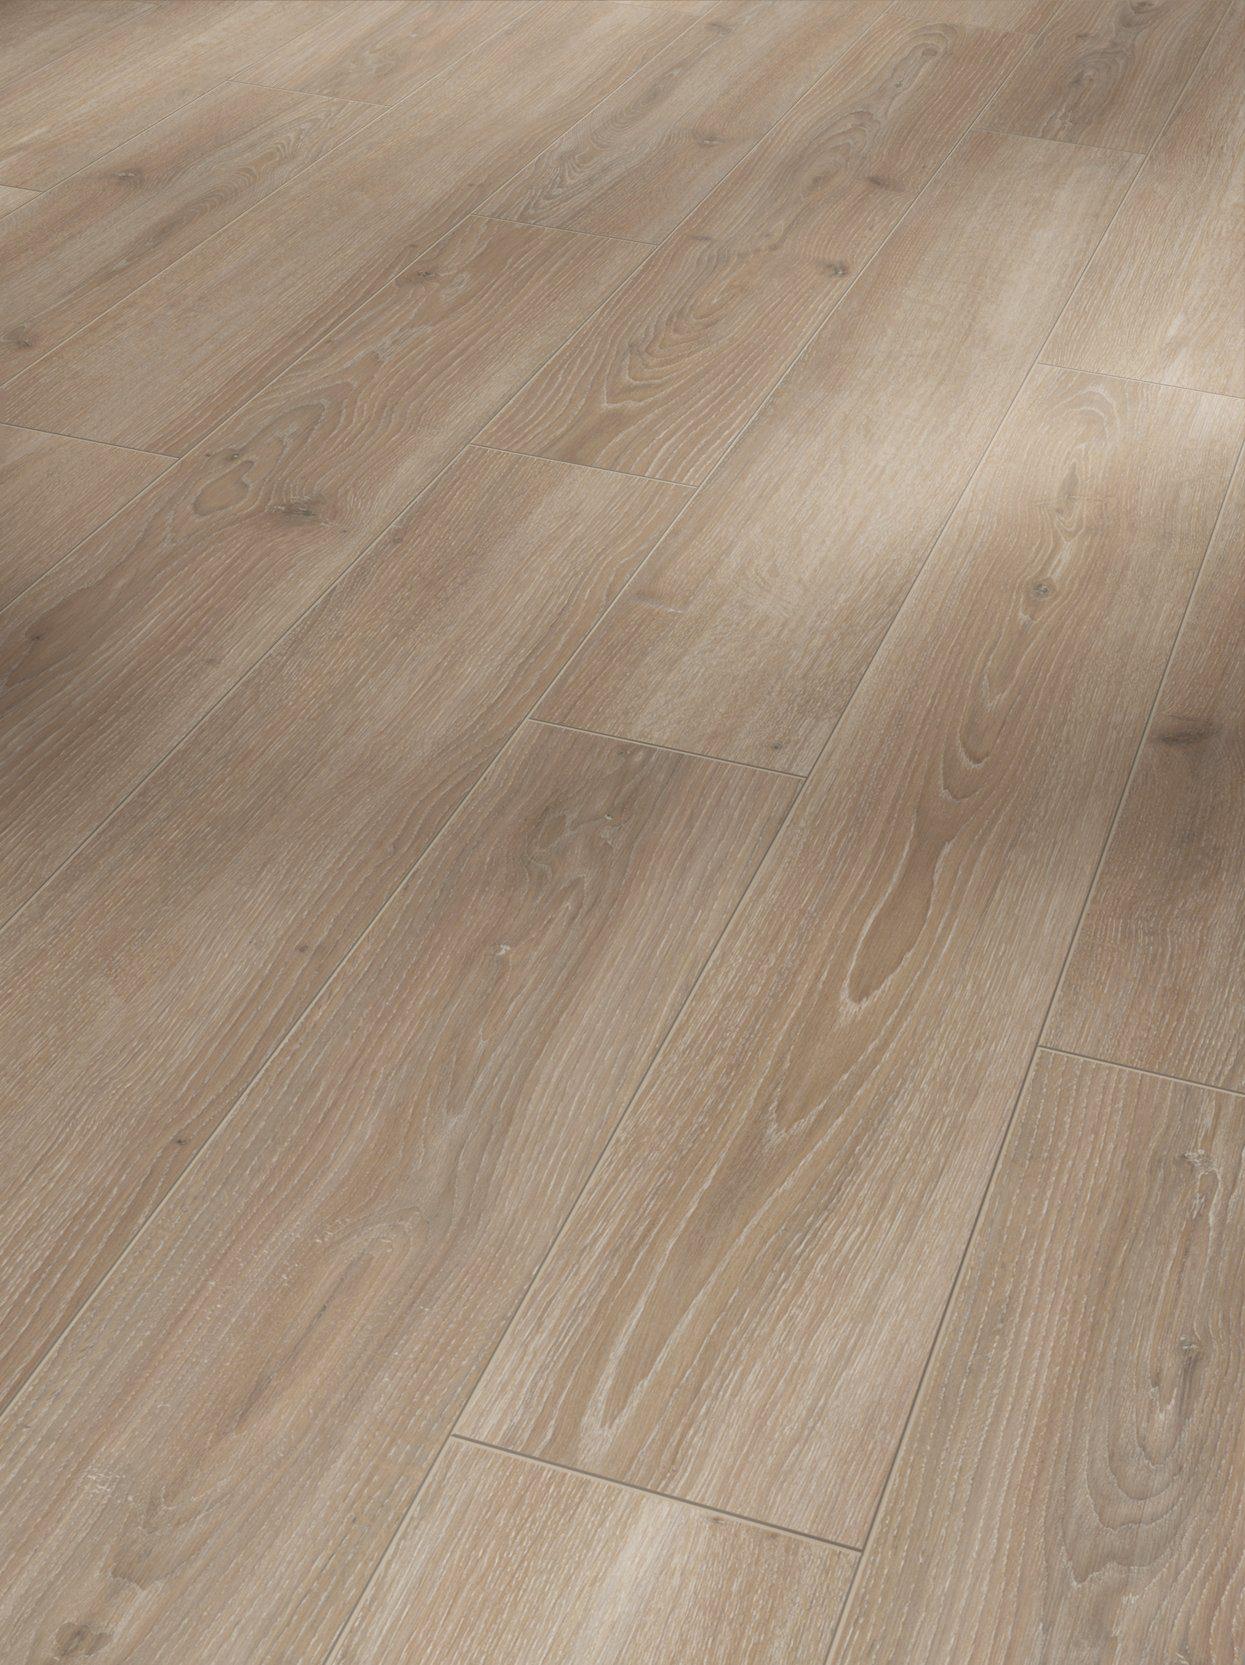 PARADOR Laminat »Classic 1050 - Eiche Skyline perlgrau«, 1285 x 194 mm, Stärke: 8 mm